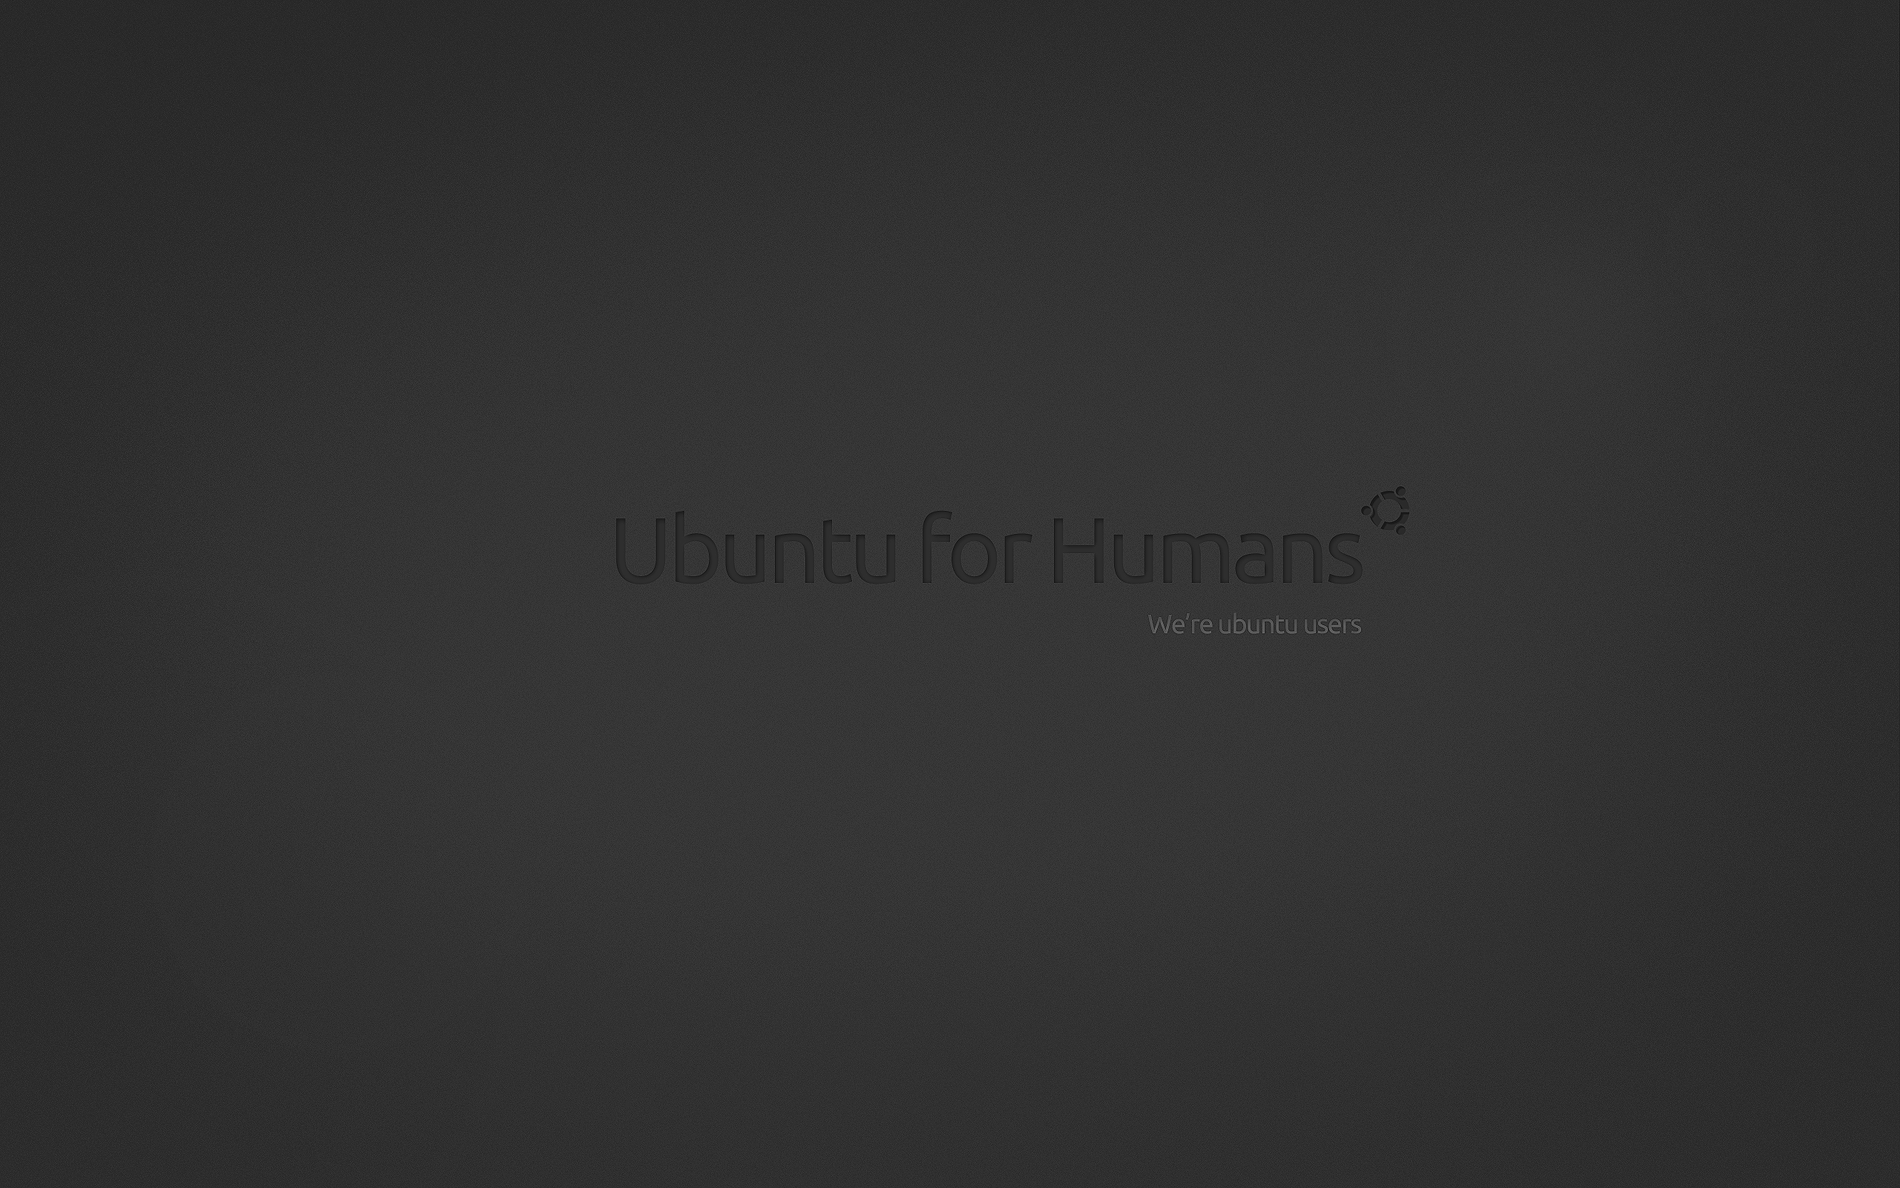 Ubuntu_for_Humans_sexy black by Felipi